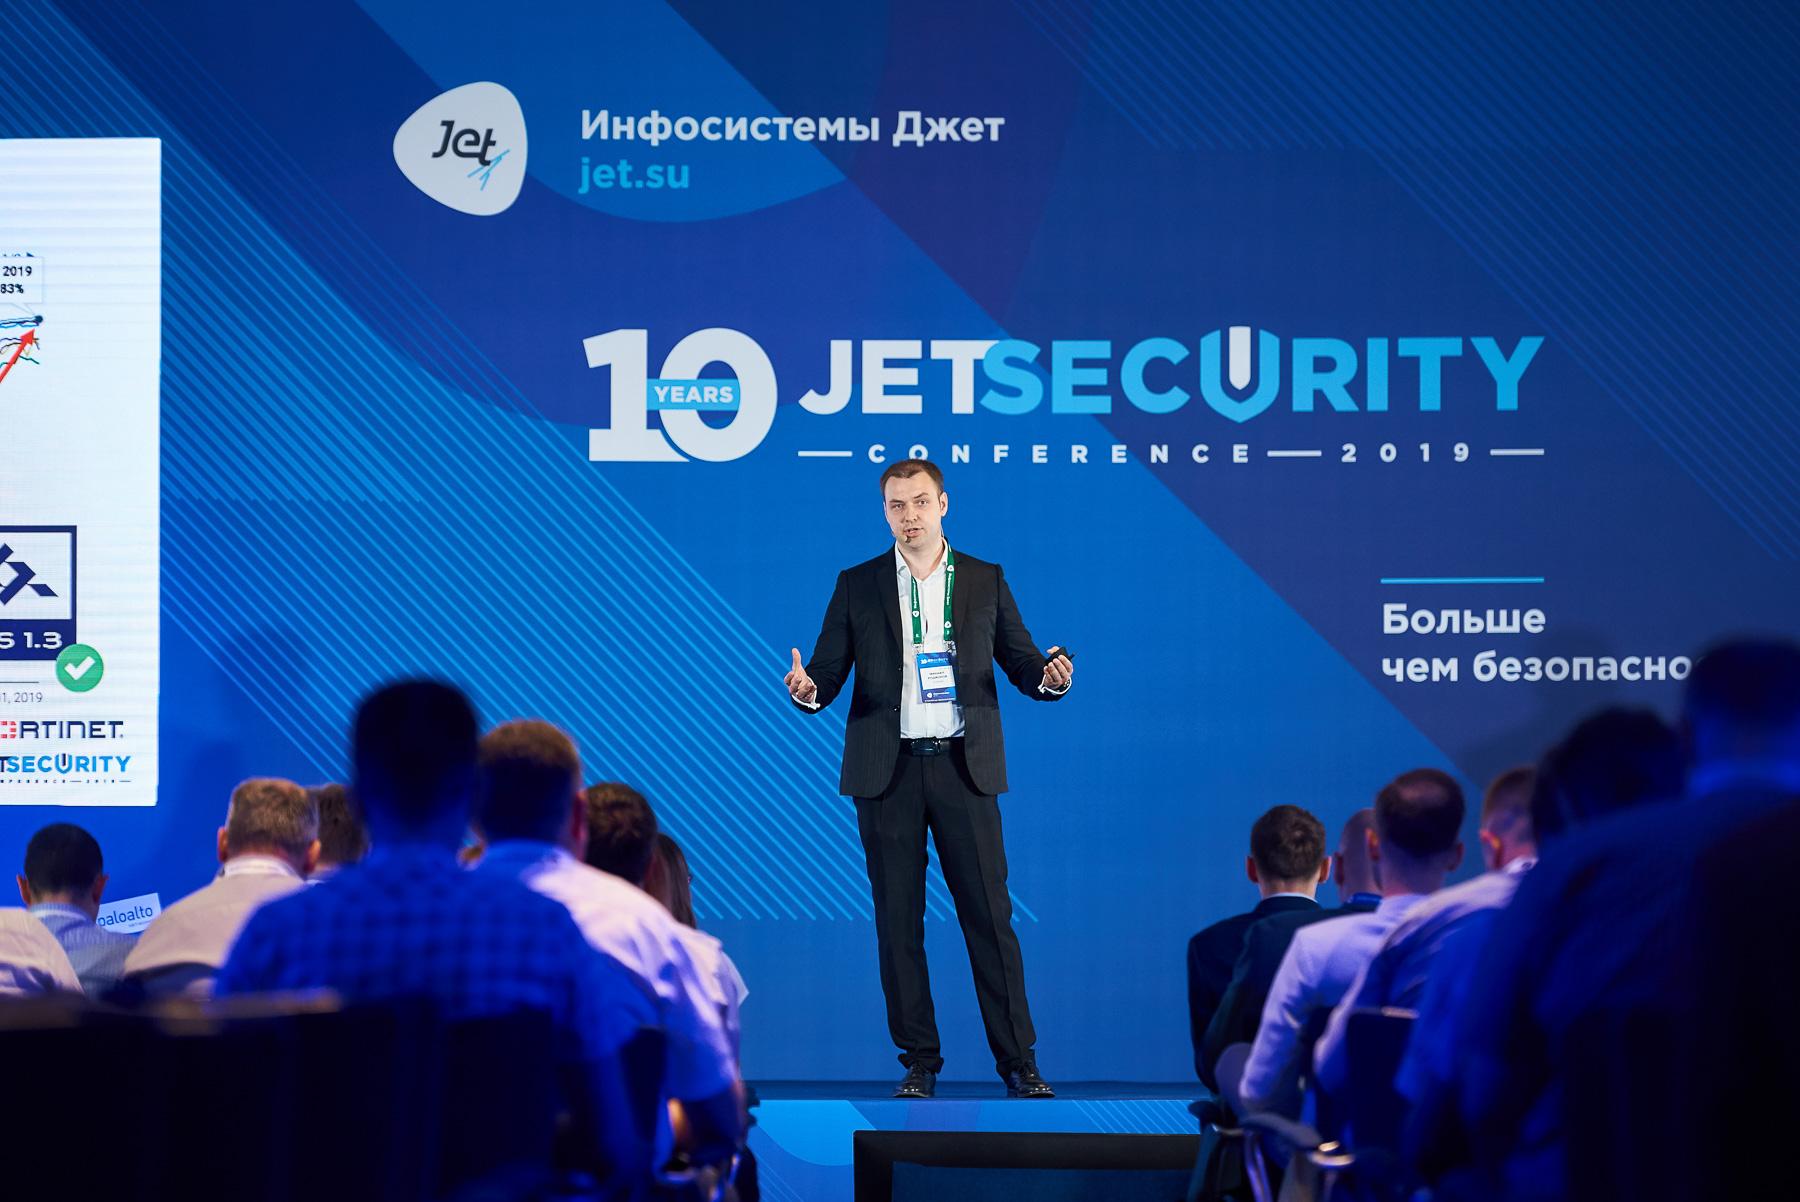 2019-06-06 Jet 286